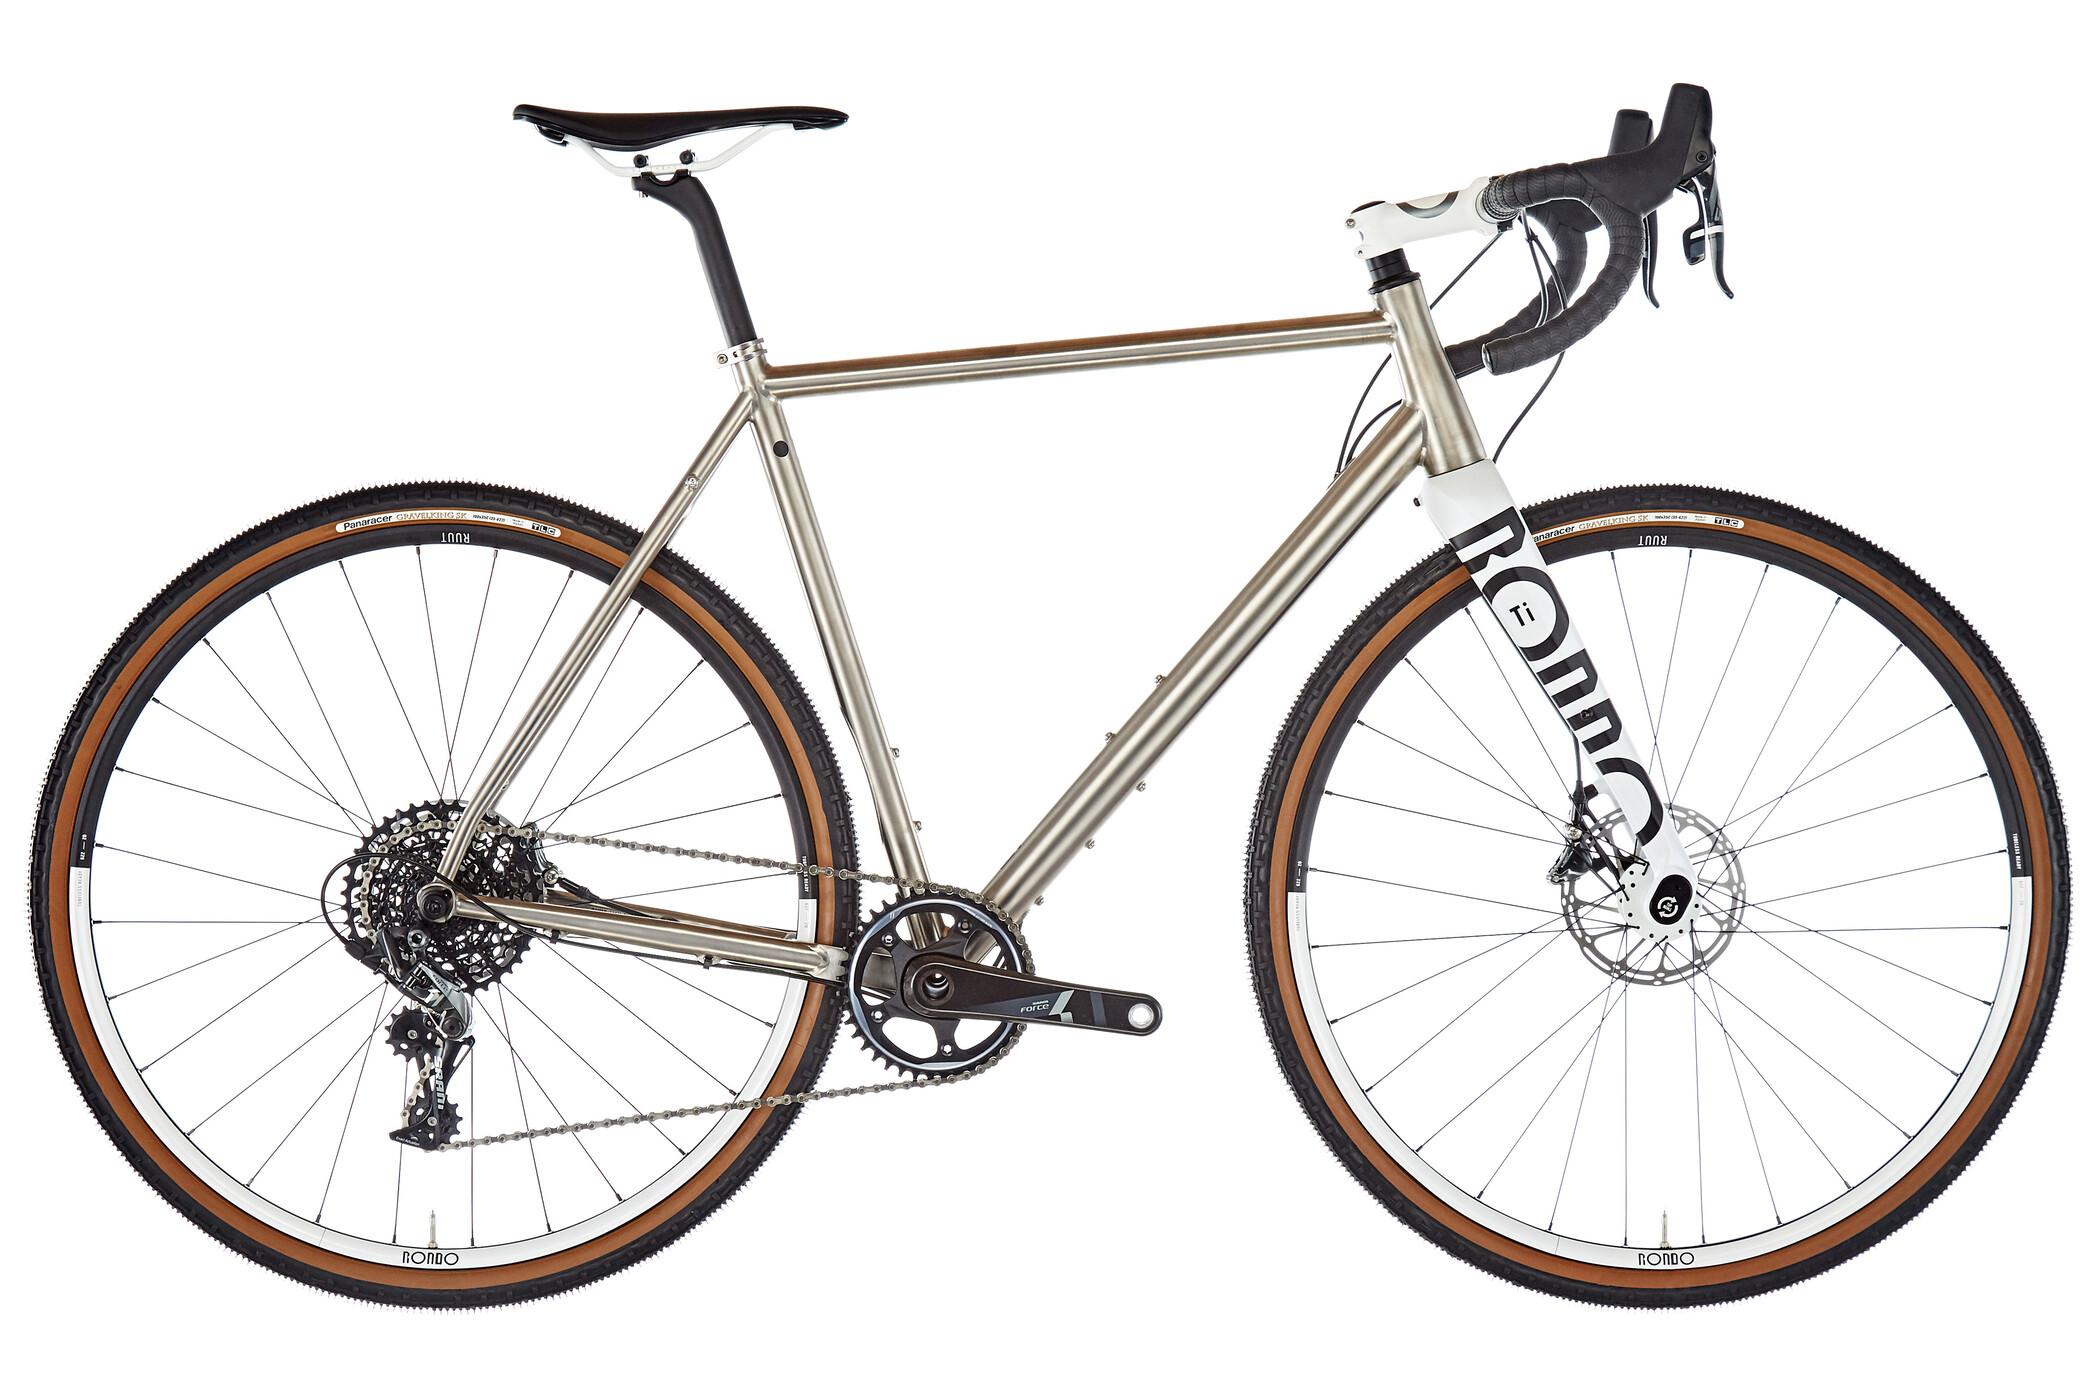 RONDO Ruut TI1 Cyclocross grå/hvid (2019)   Cross